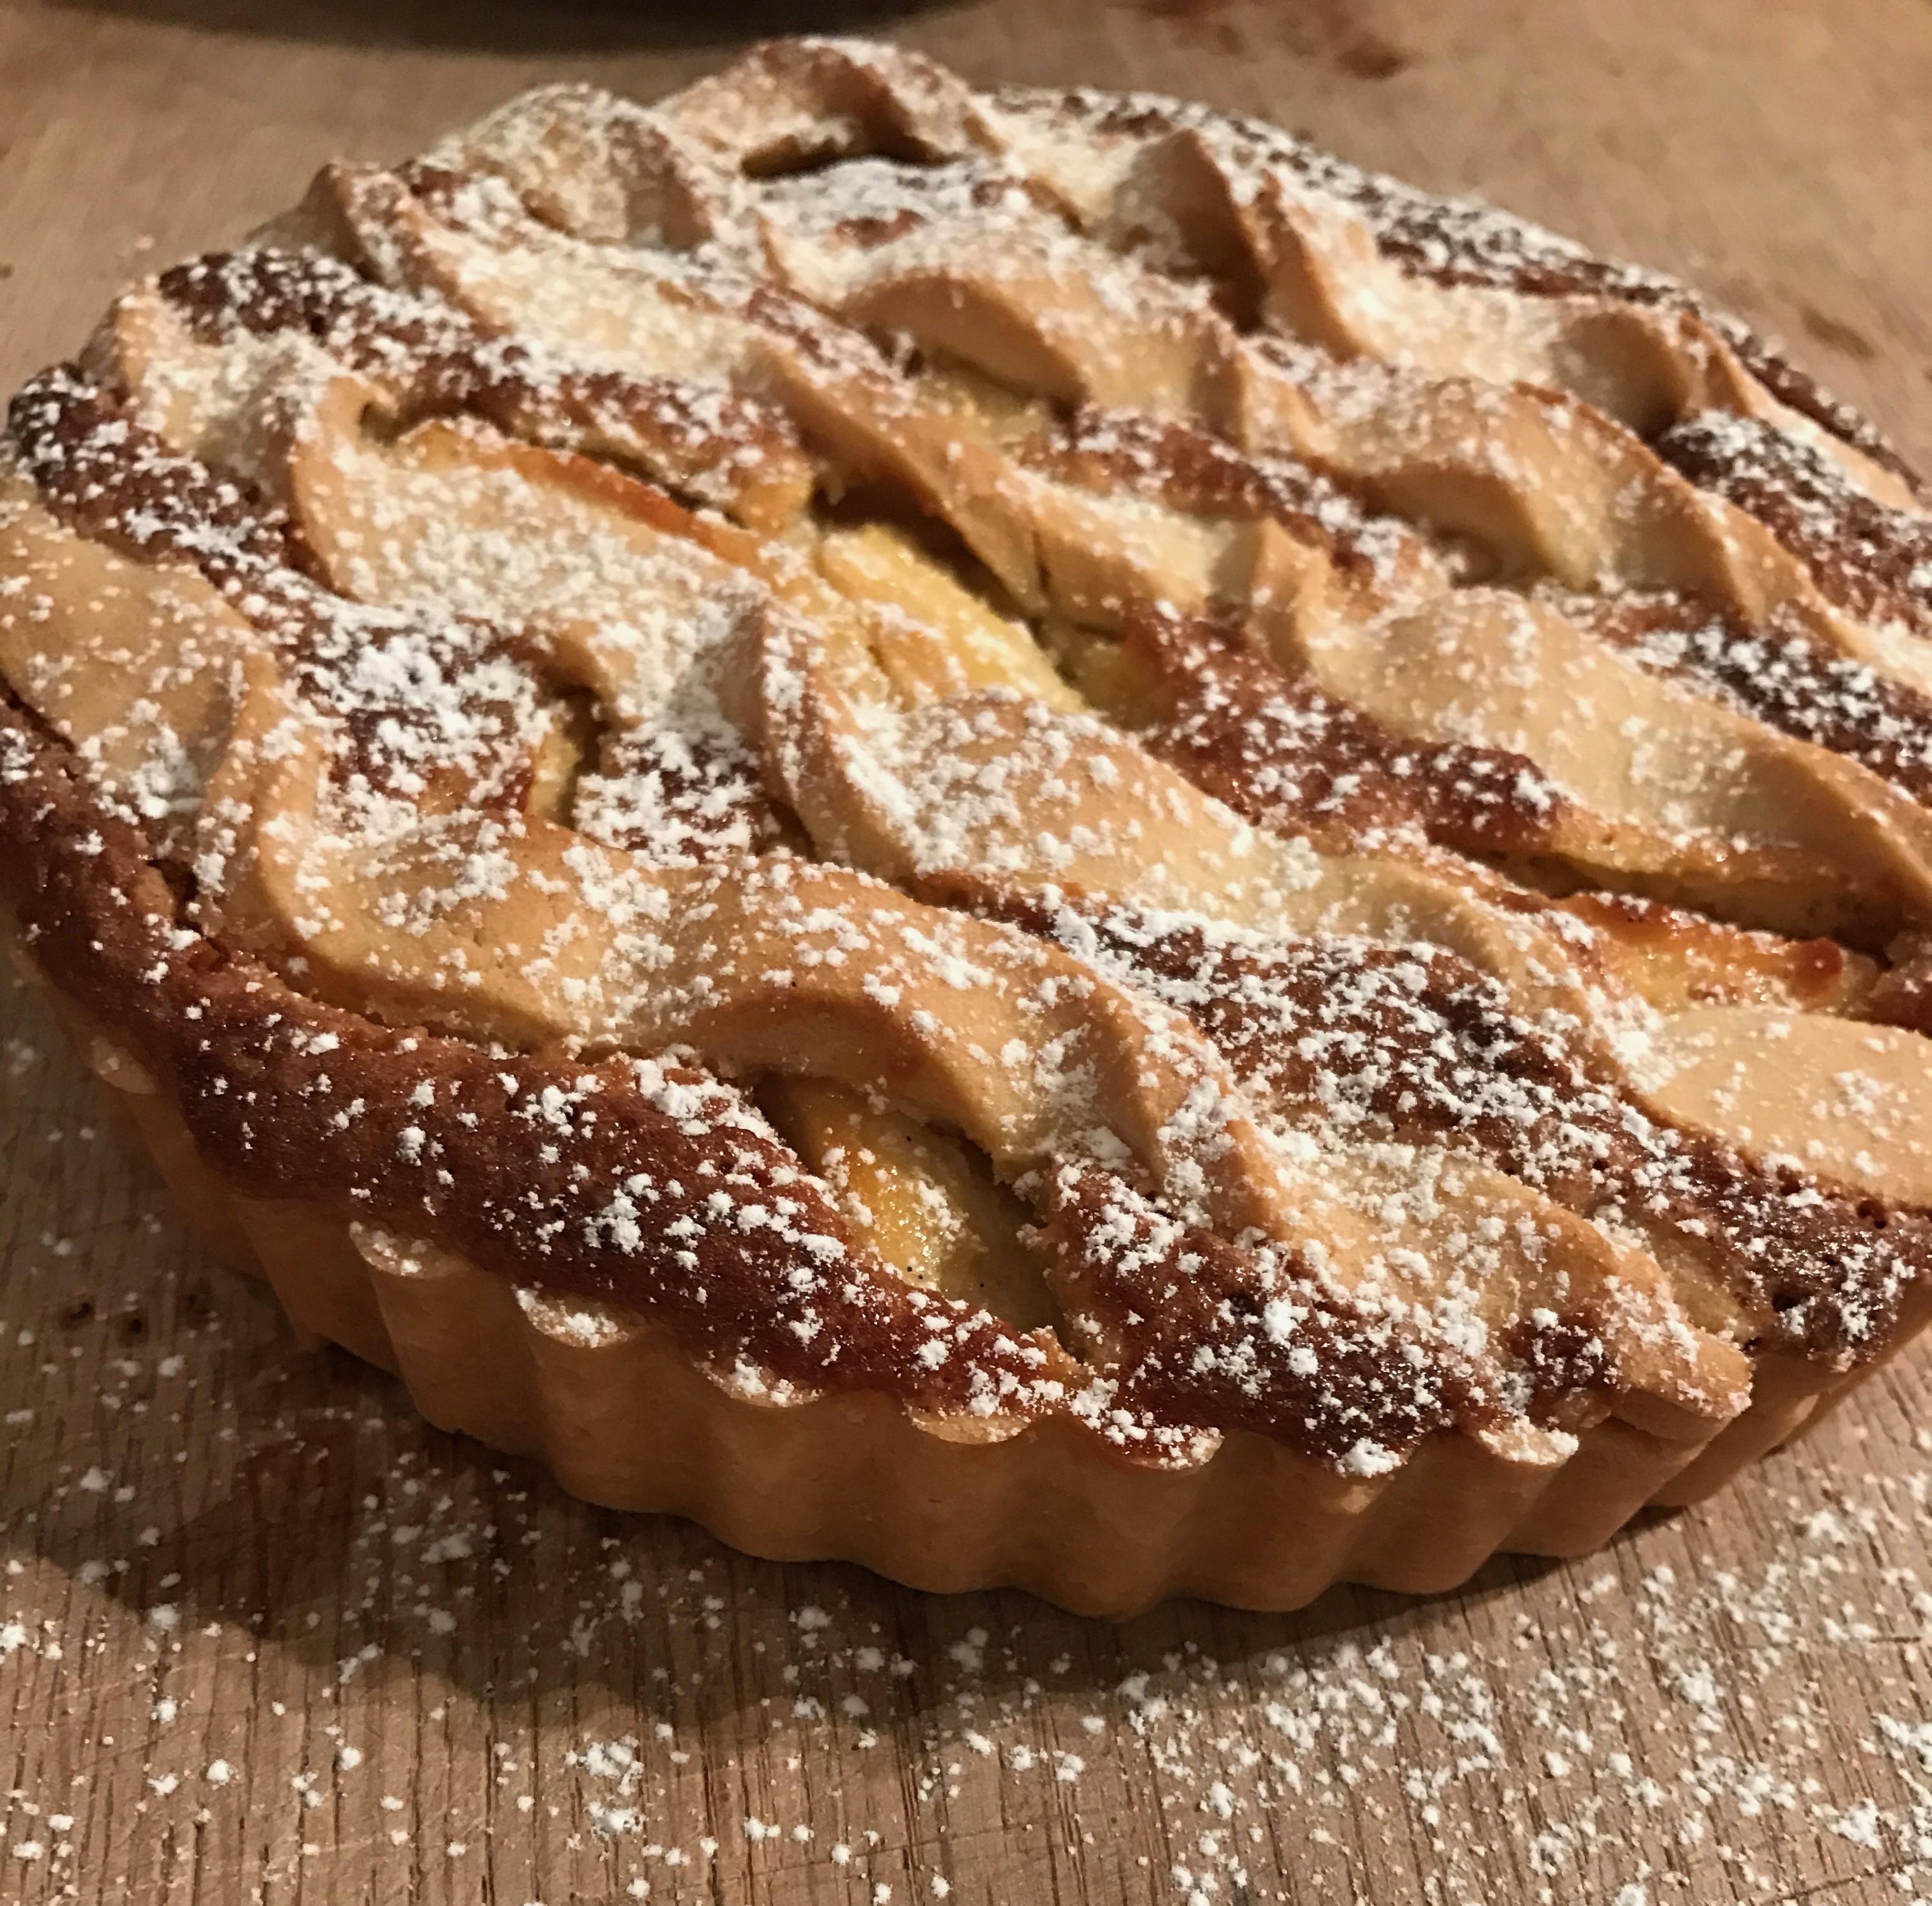 Lun æbletærte med marcipan